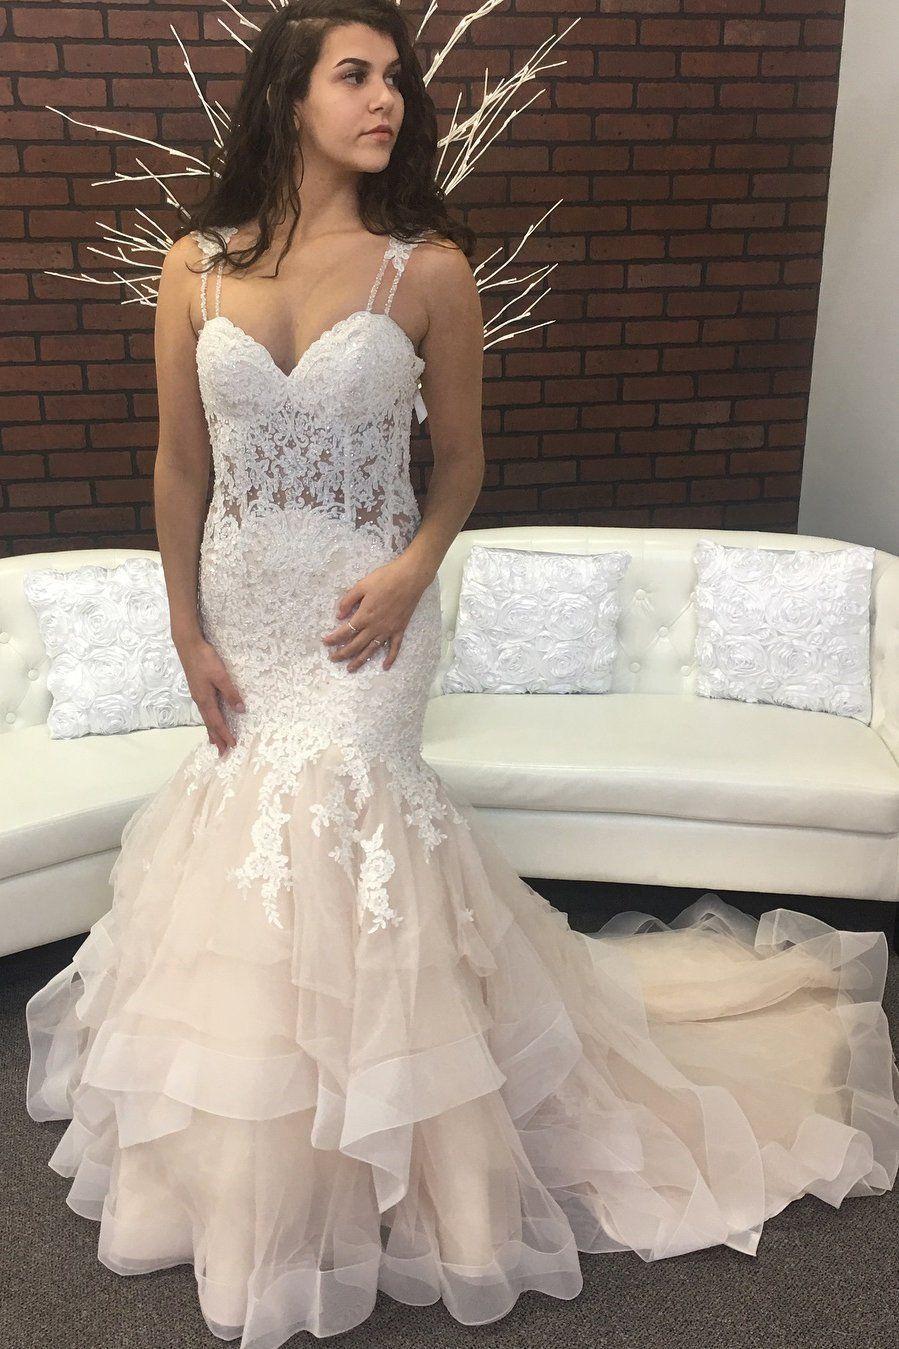 Einzigartige Ballkleider, Sexy Mermaid Tulle Sweetheart Lace Layered Champagner Brautkleider 2020 CoBridal